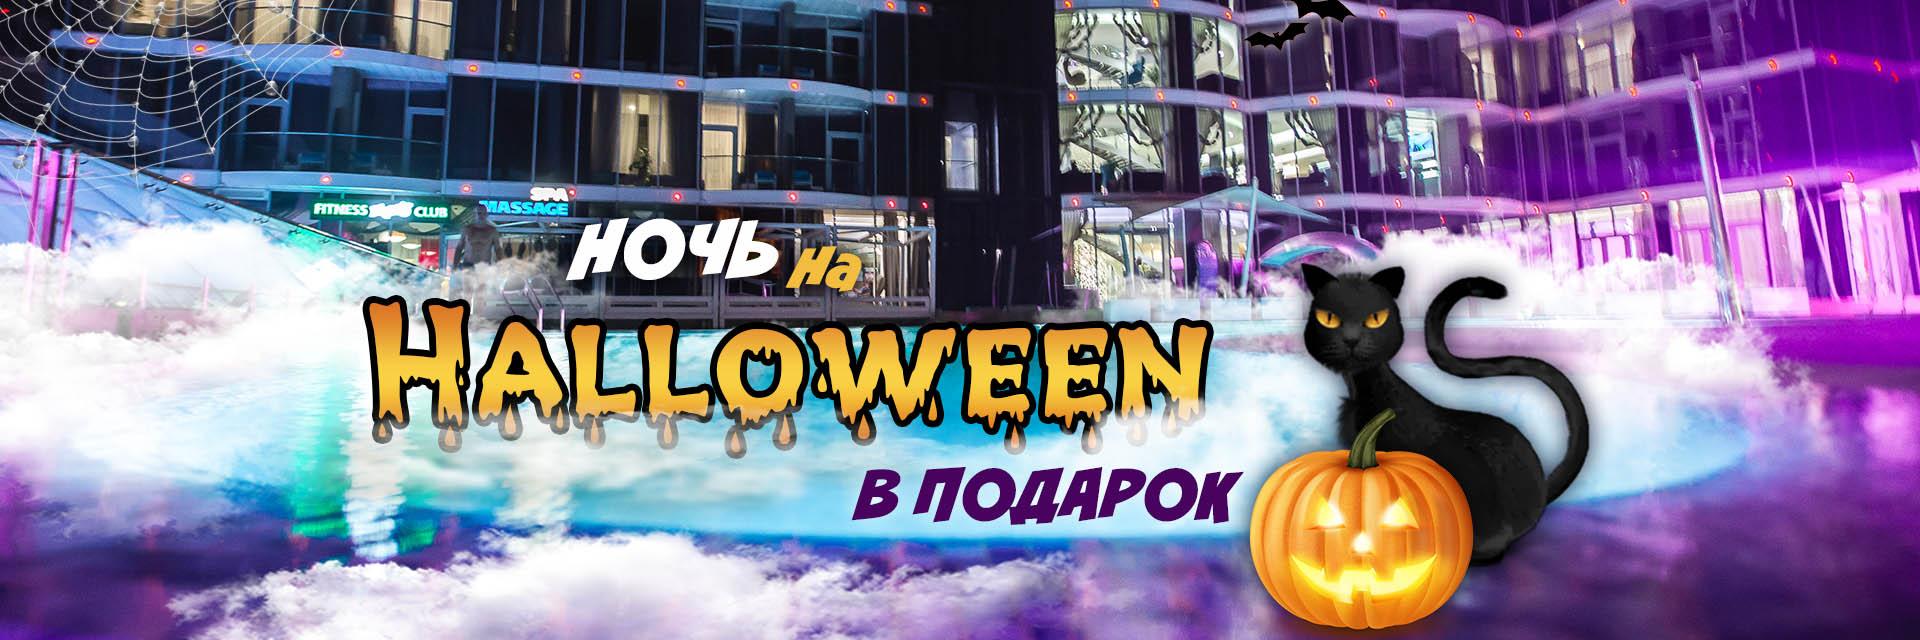 Ночь на Хеллоуин — в подарок! в RESORT & SPA HOTEL NEMO, фото № 1